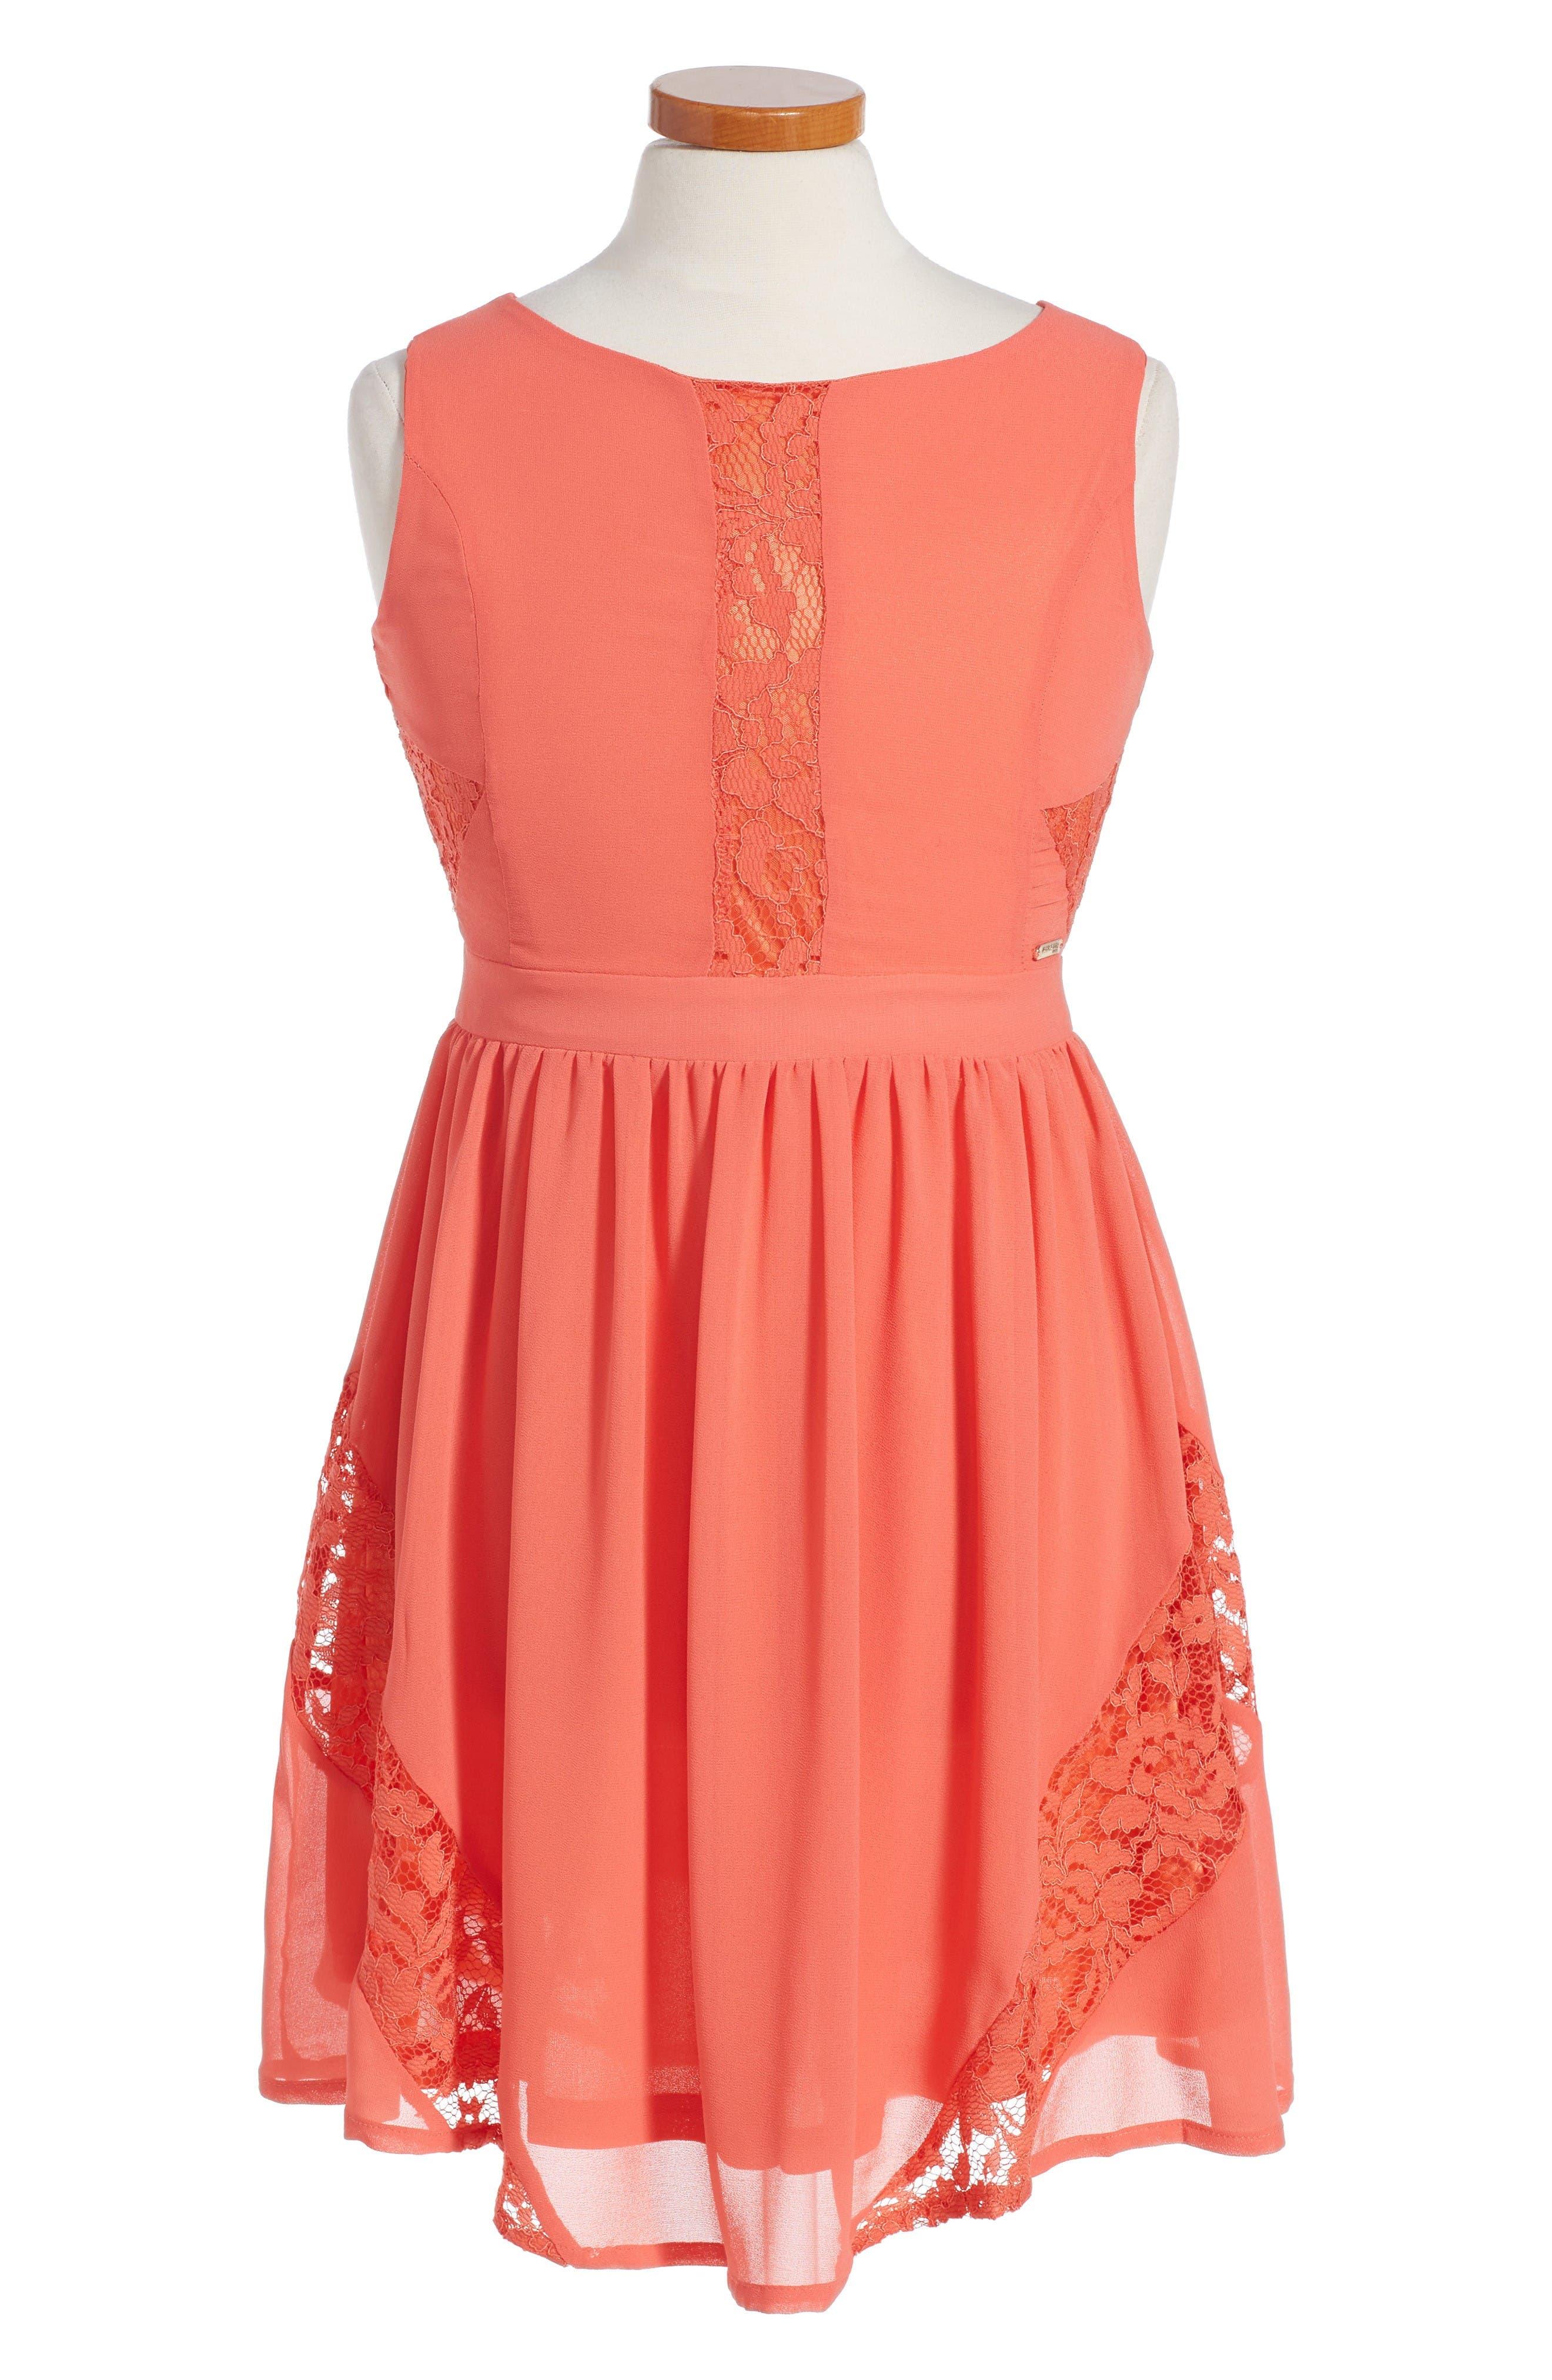 MARCIANO Lace Inset Fit & Flare Chiffon Dress